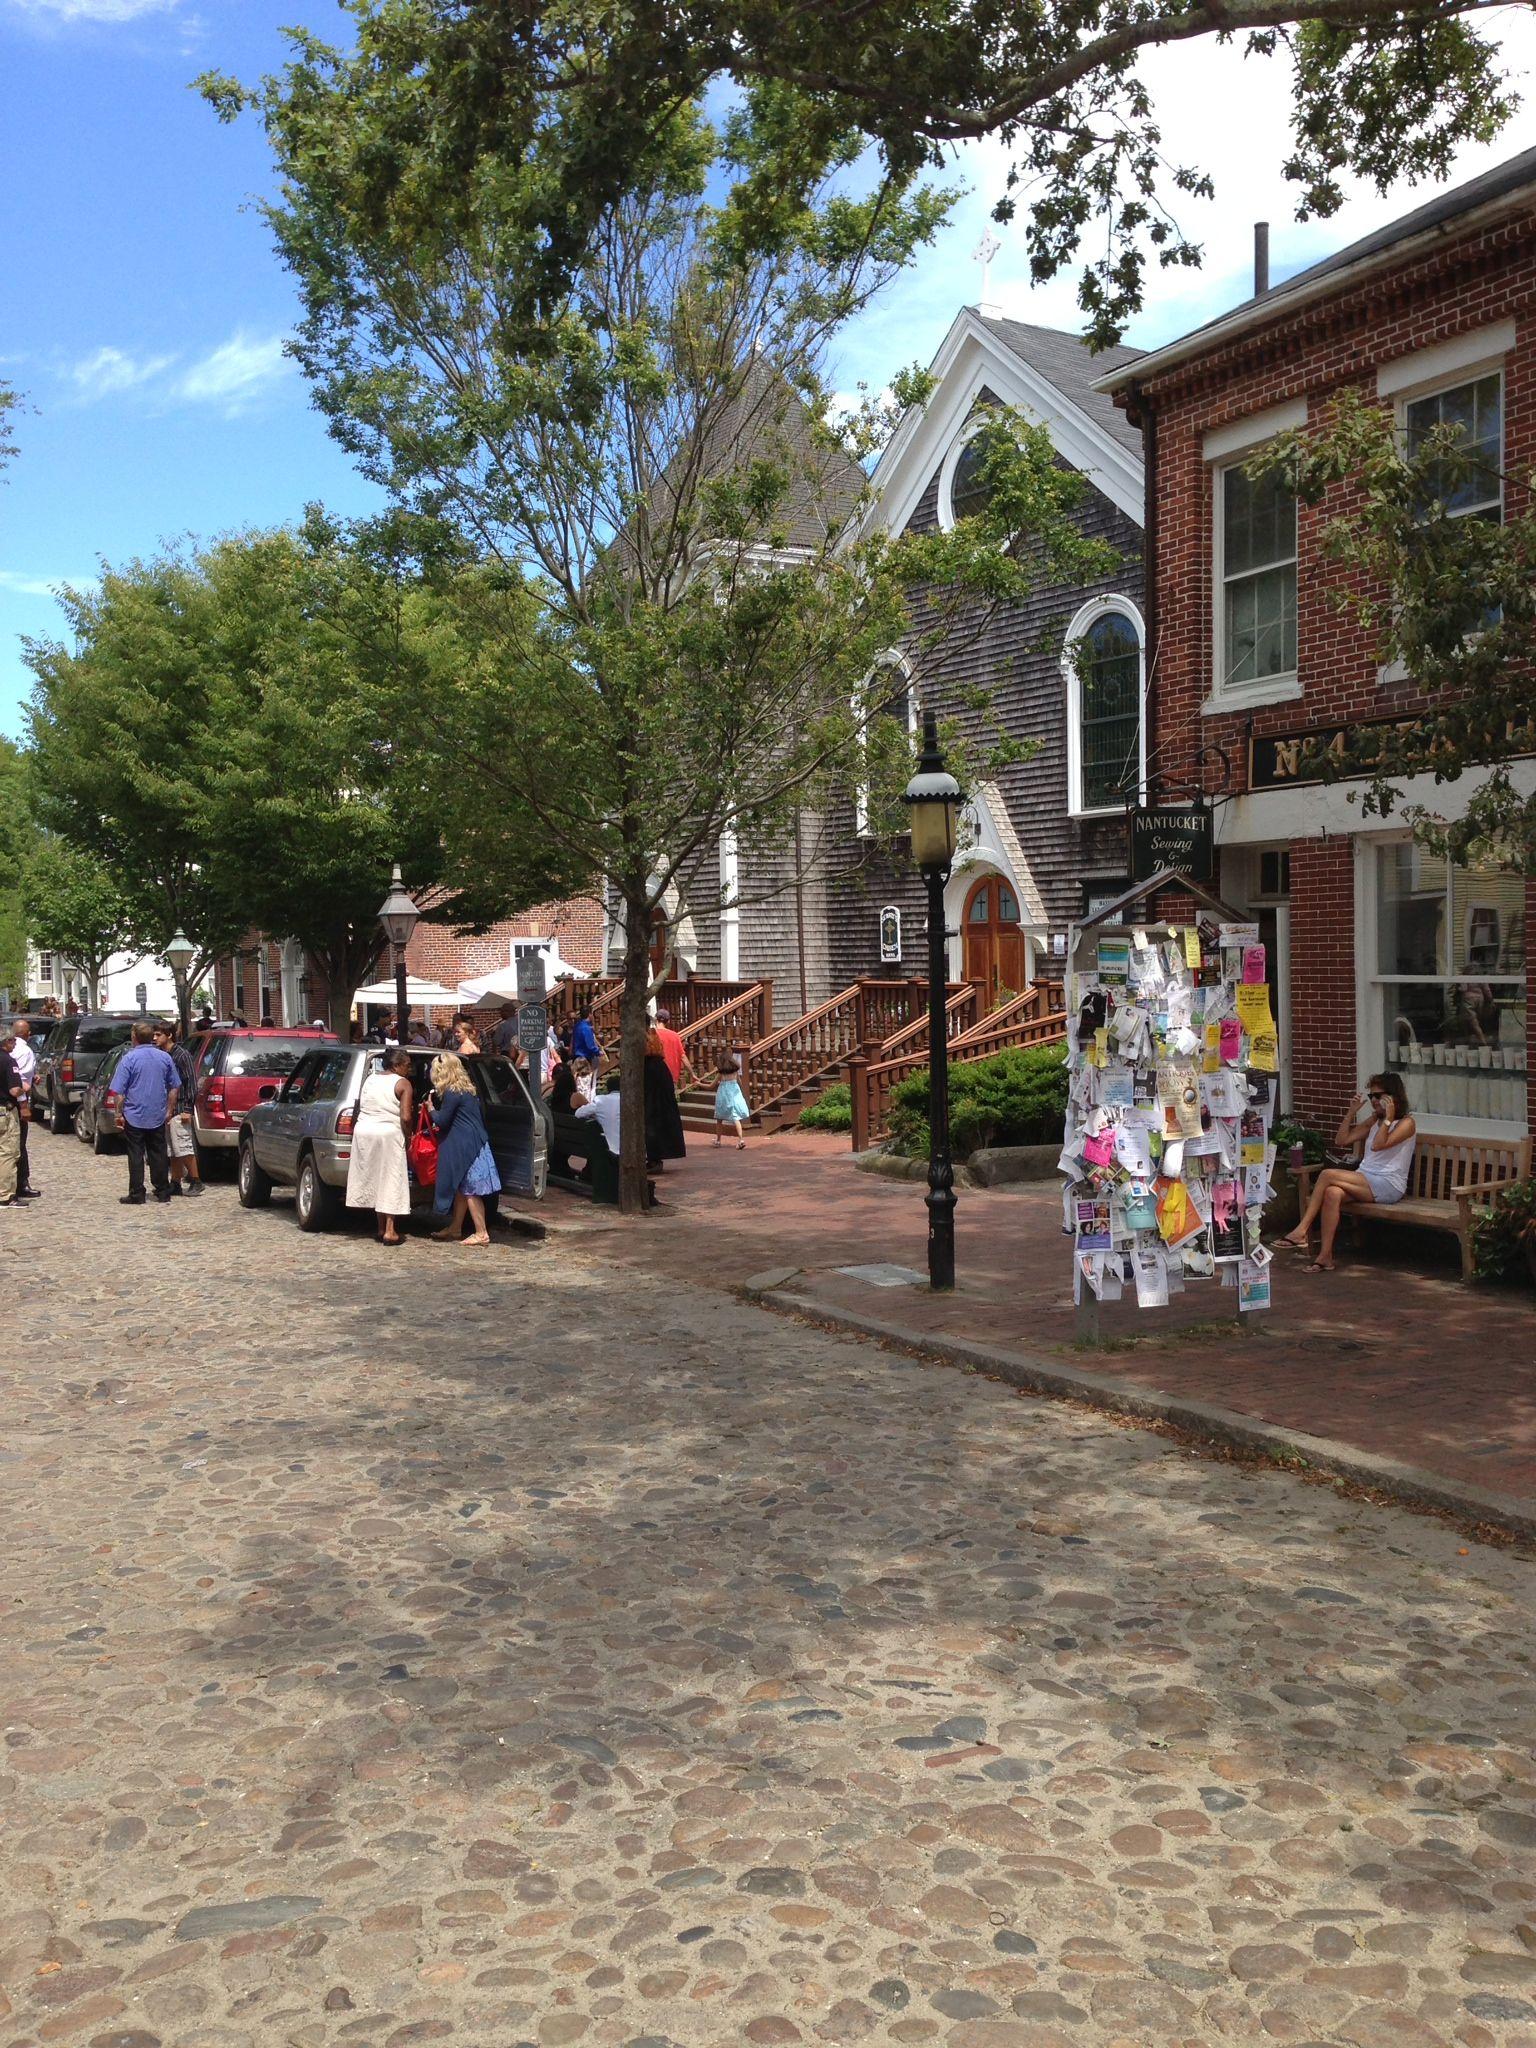 Cobblestone streets add charm in historic Nantucket.